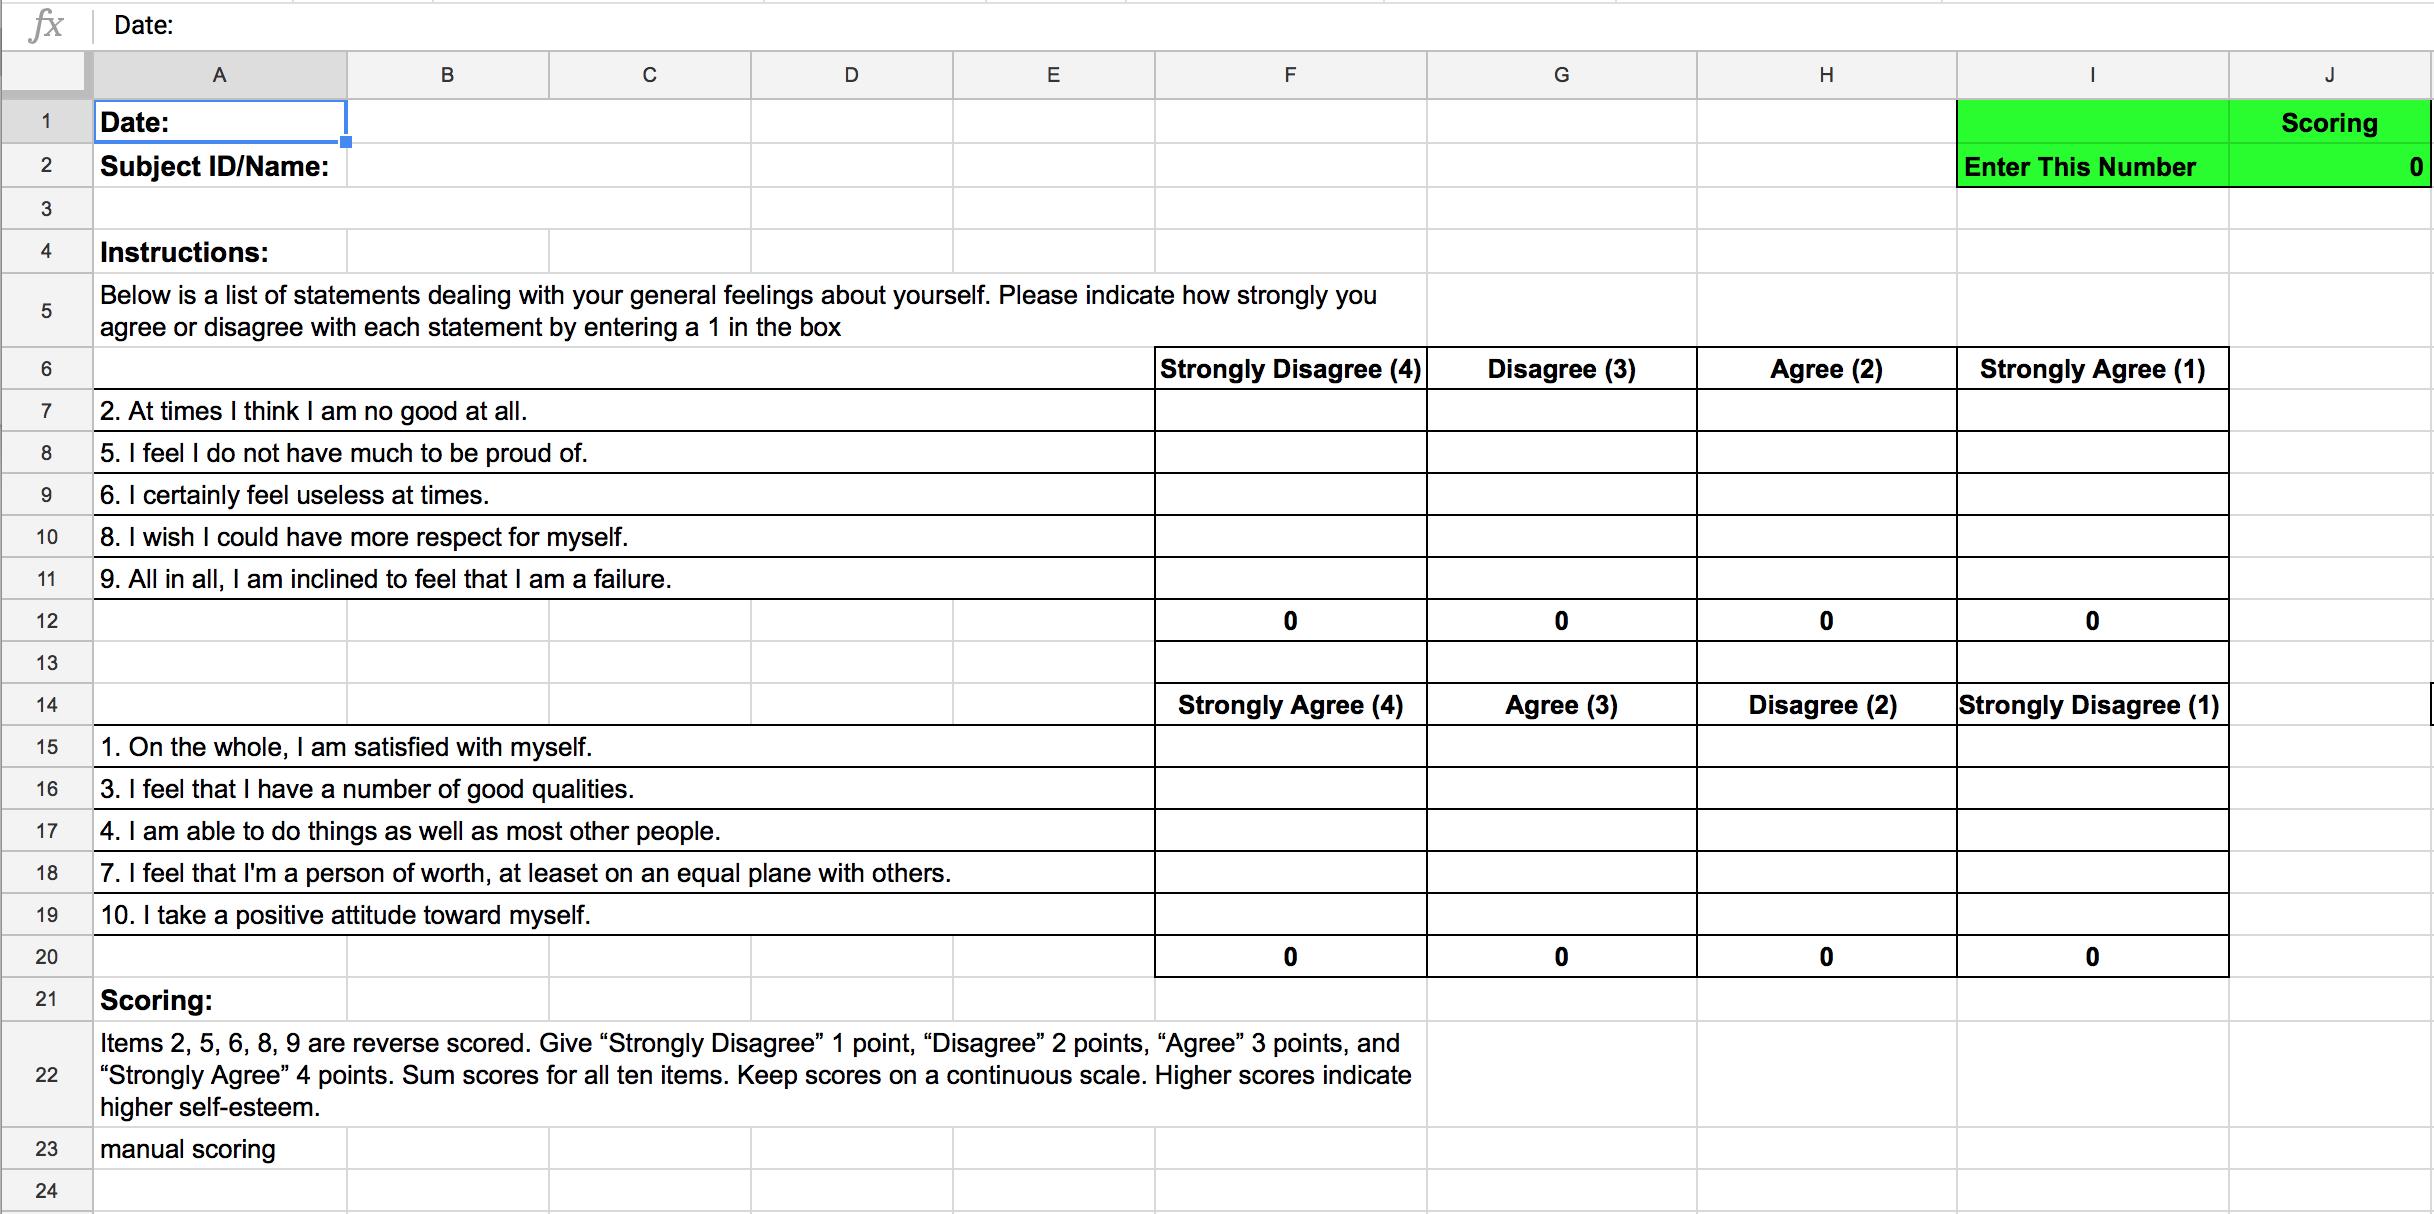 Sample of a google sheet assessment